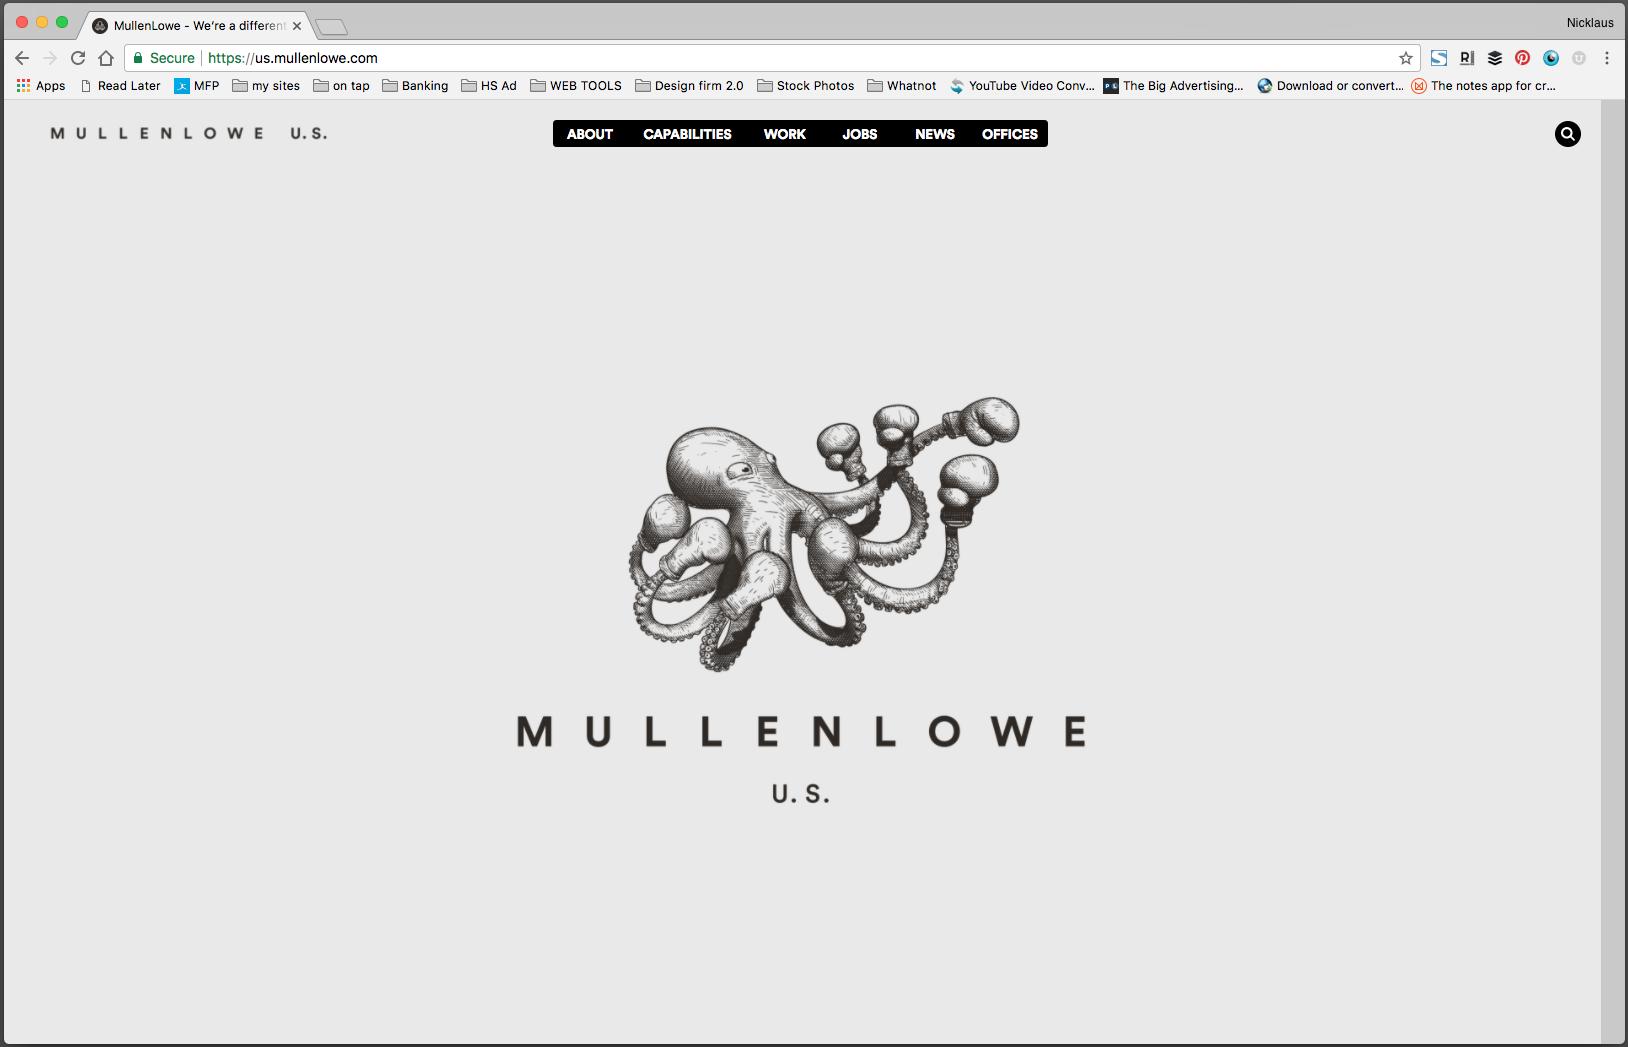 Mullenlowe Digital Advertising Web Design Advertising